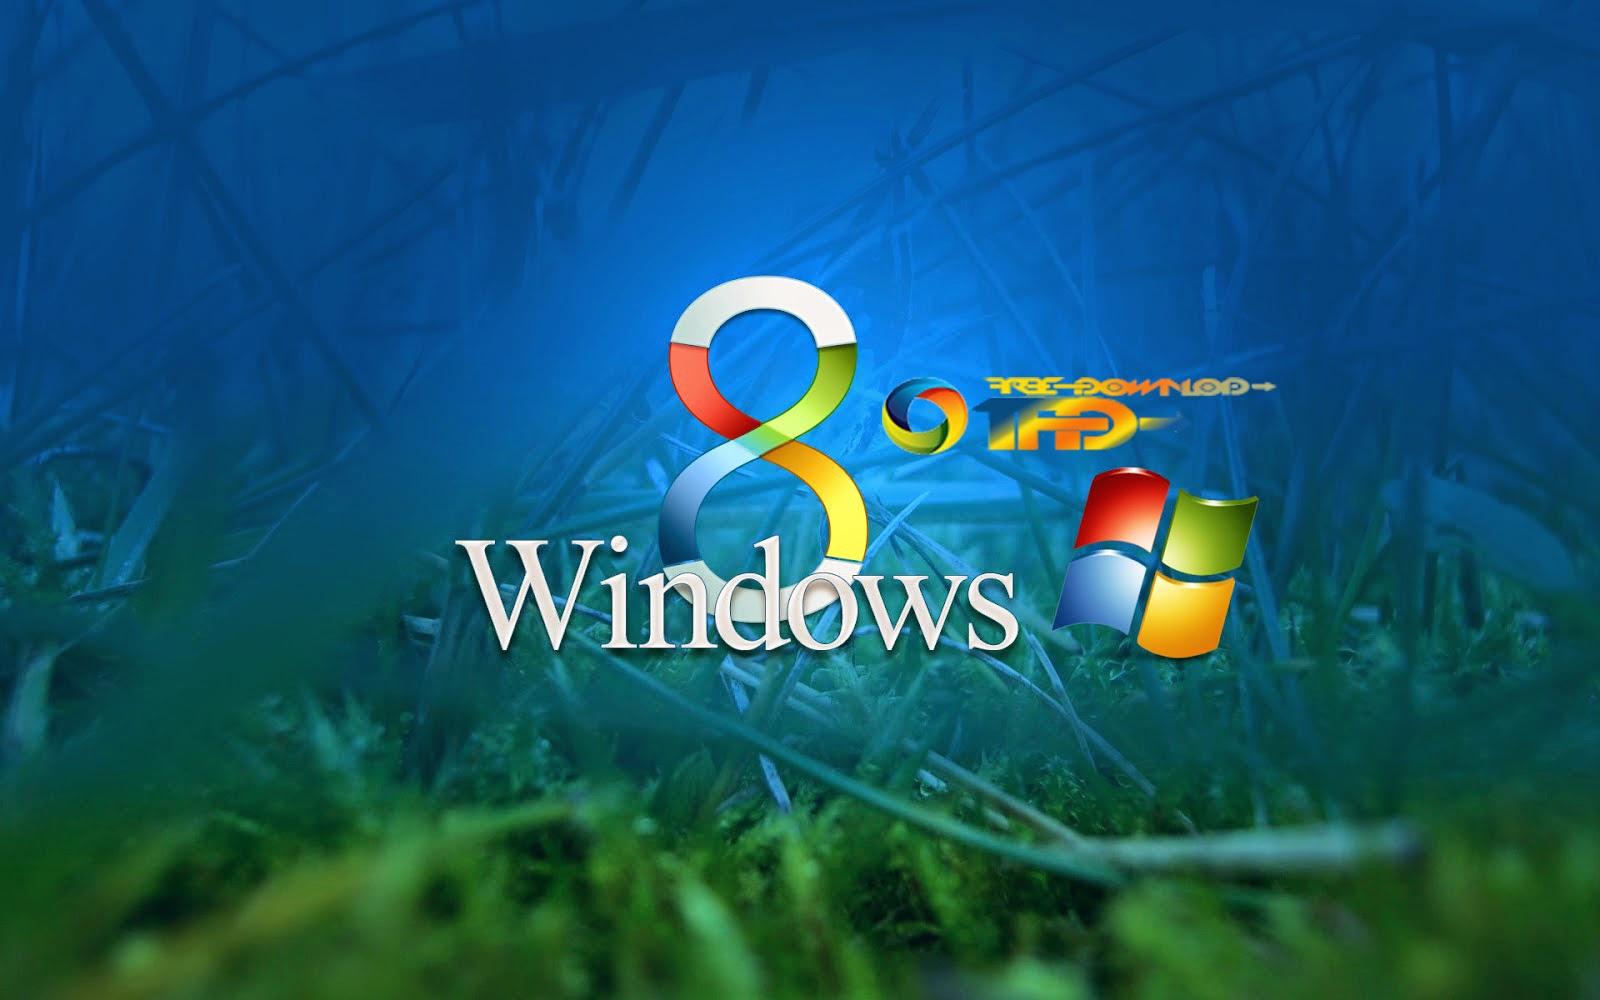 Windows 8 Pro ISO 32/64 Bit Serial Key